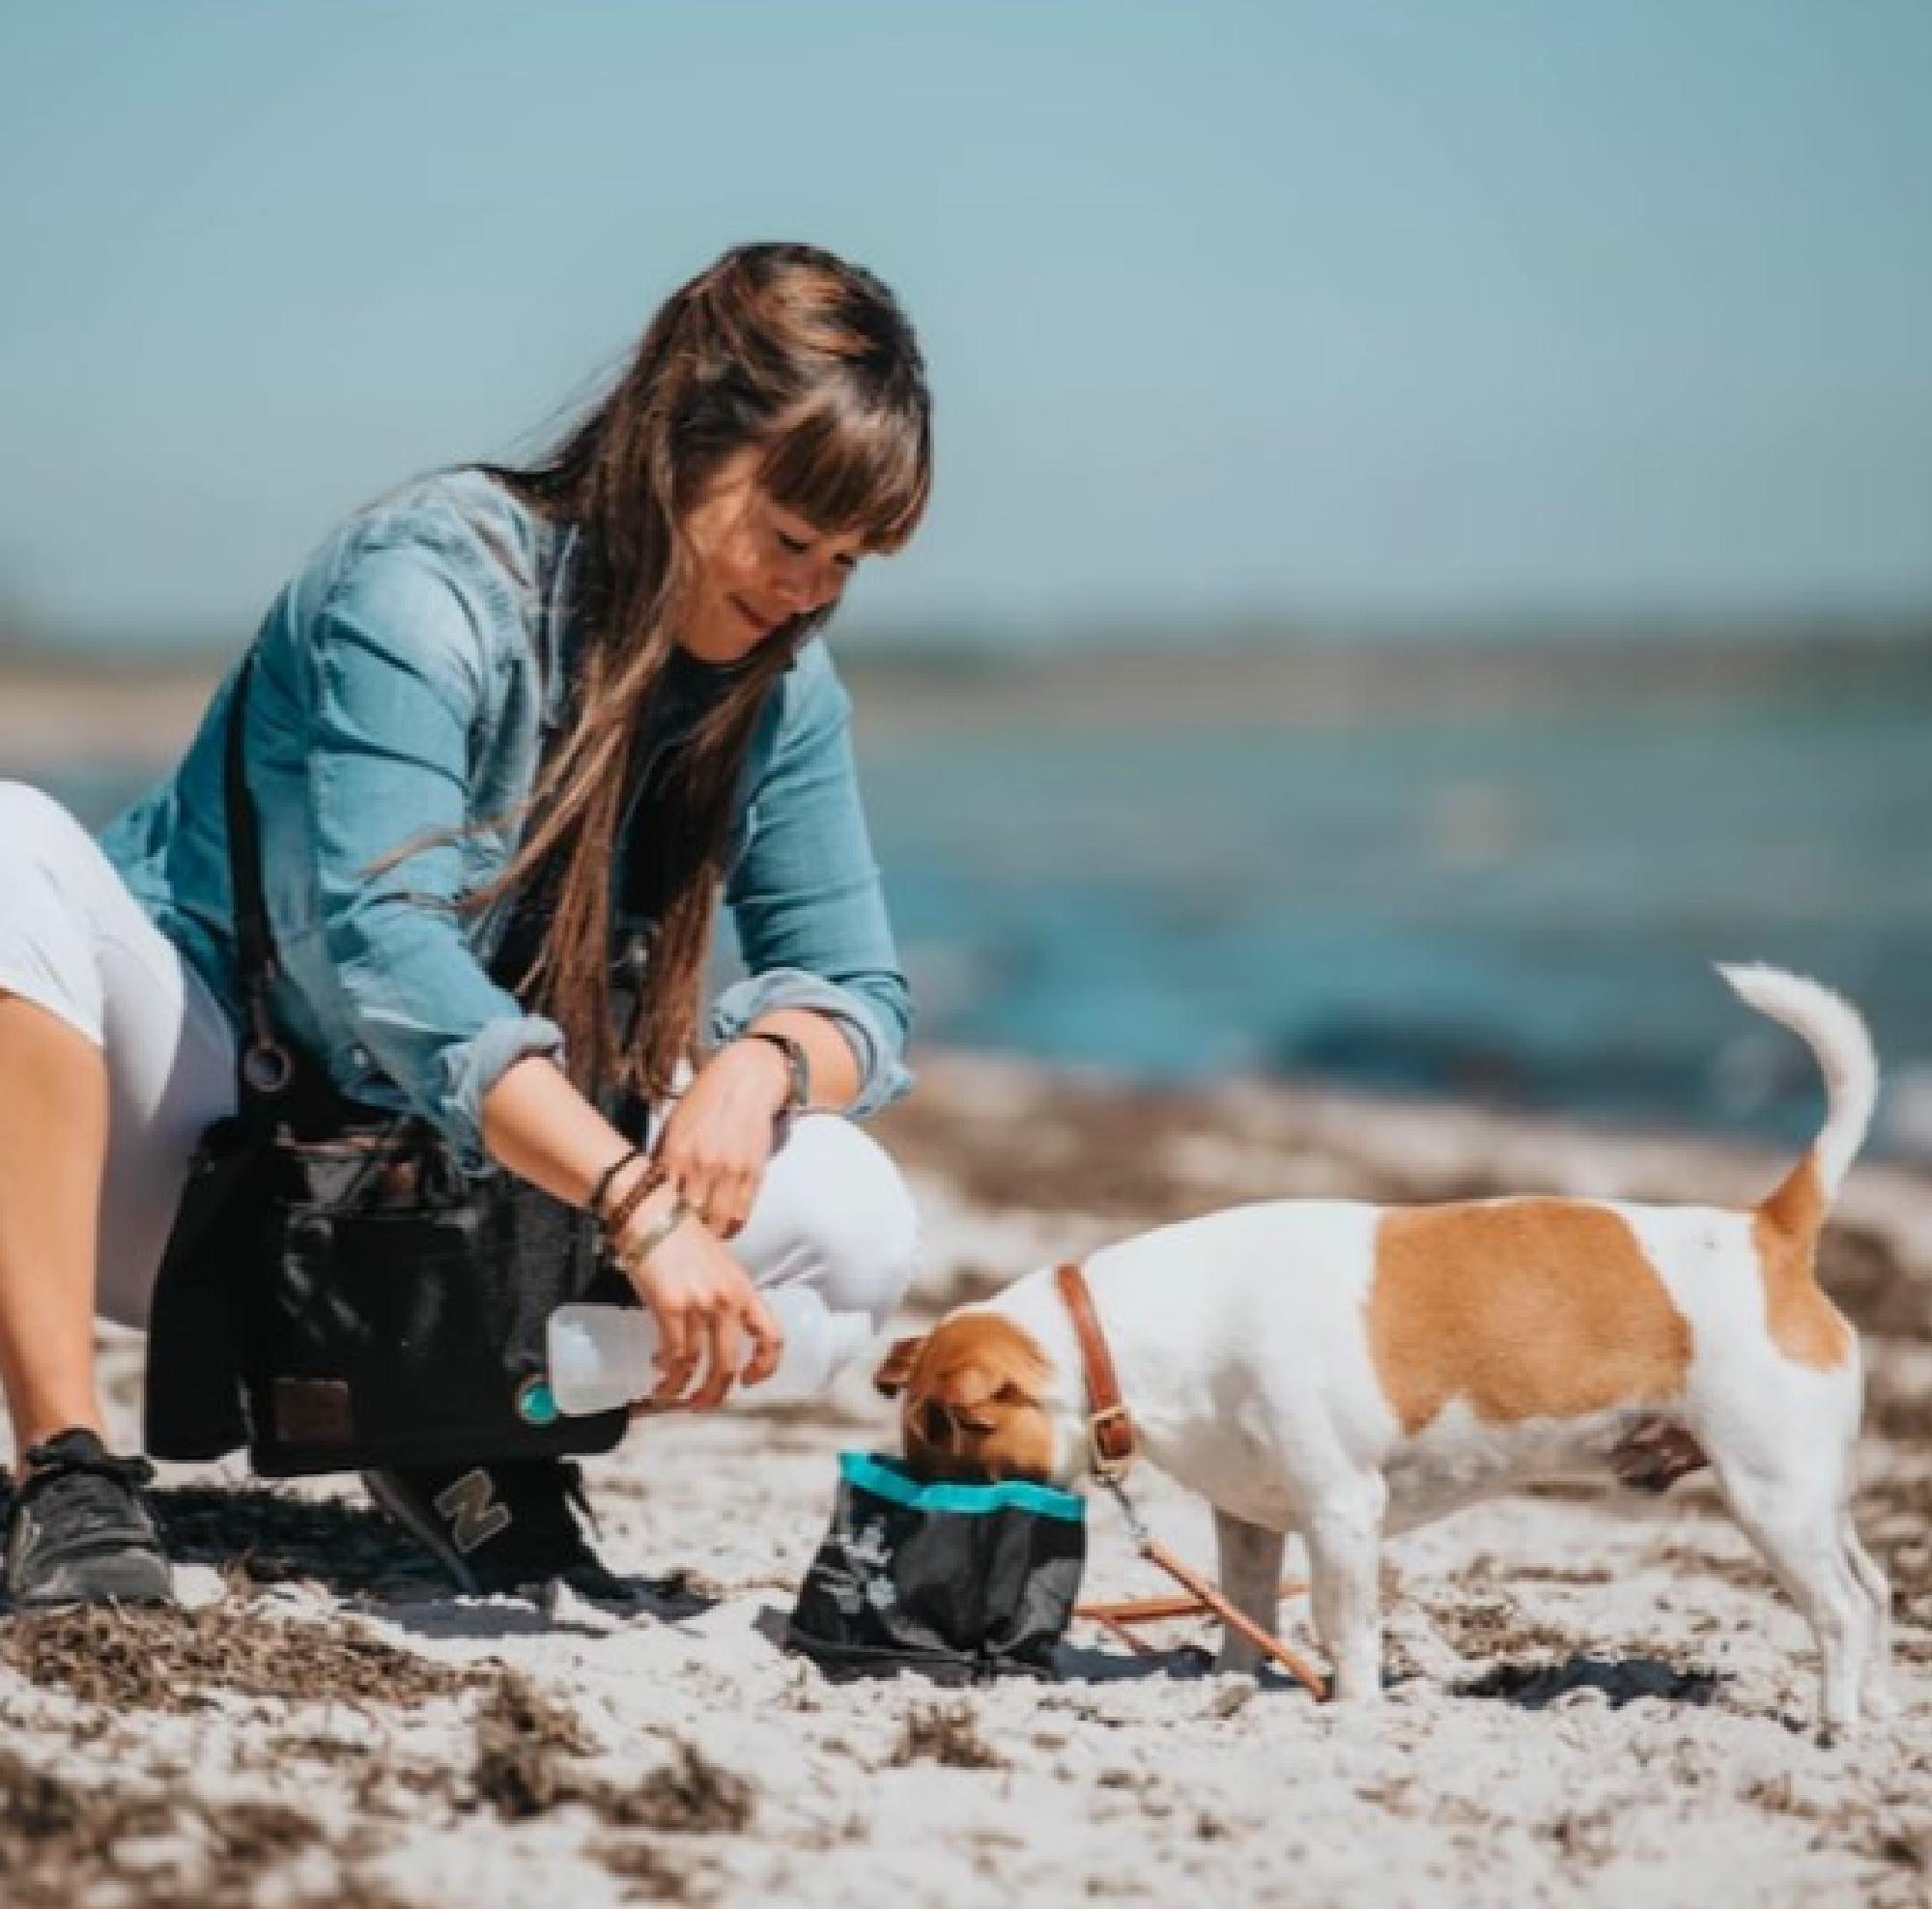 DogCoach Vattenskål i tyg, ihopfällbar